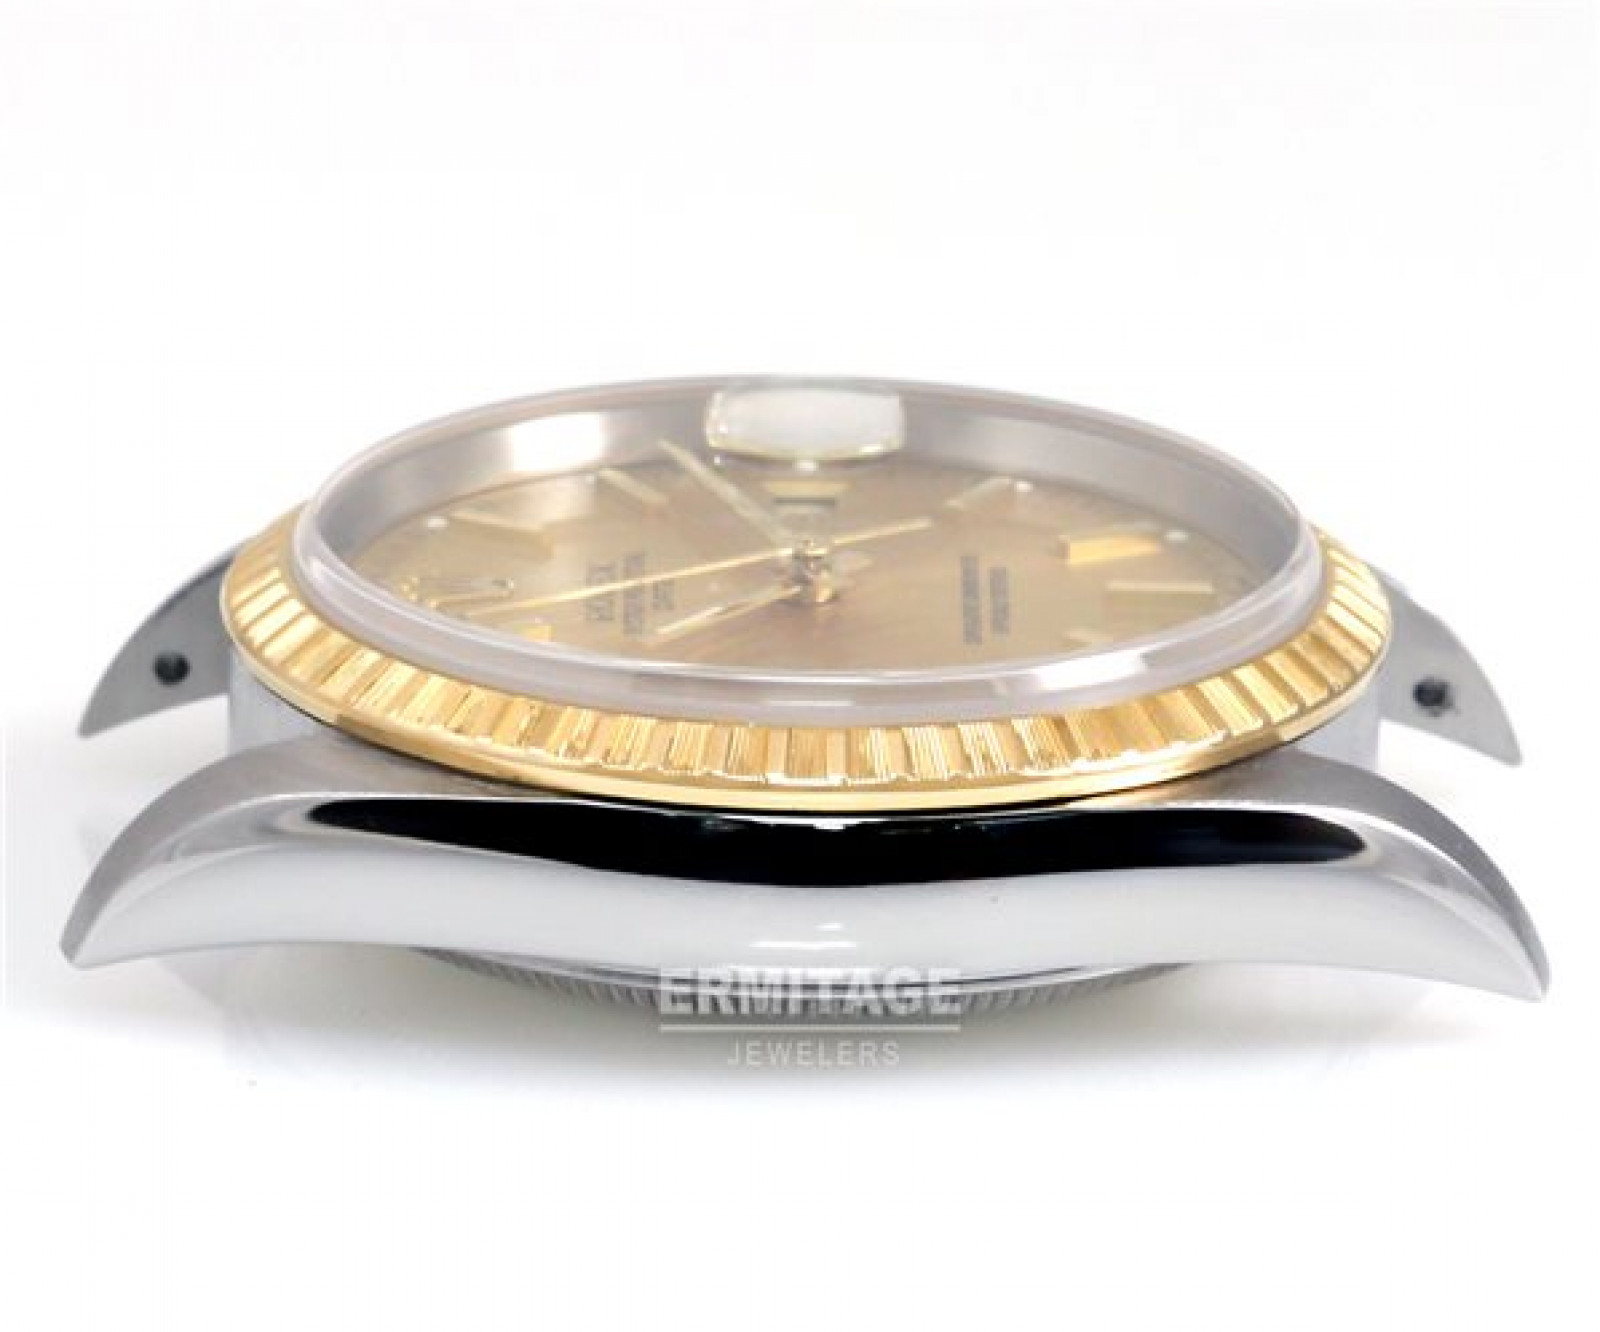 Rolex Date 15233 Gold & Steel Champagne 2005